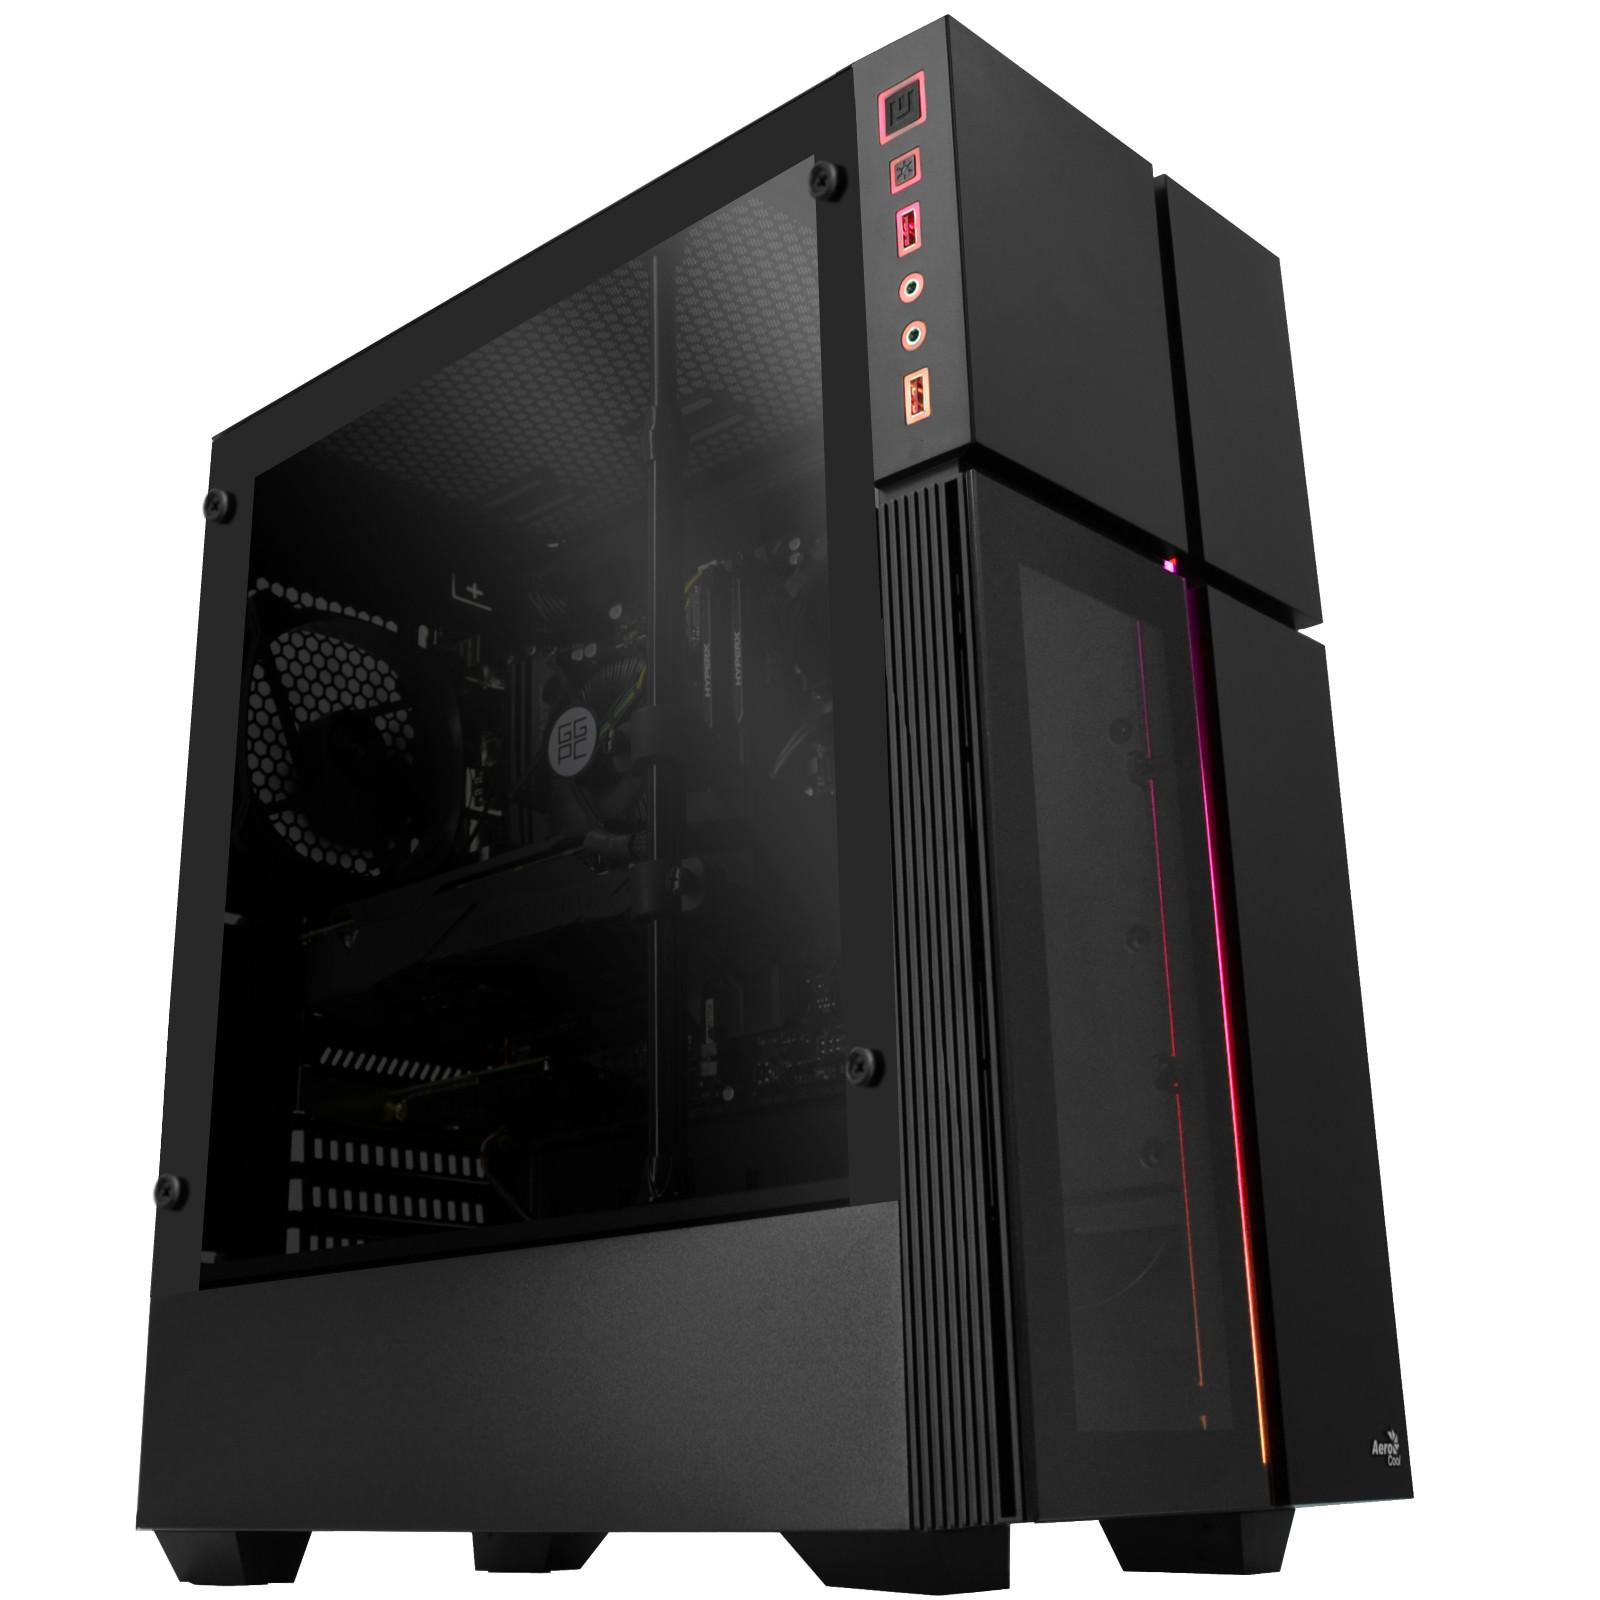 Buy the GGPC Crusader RTX 2070 Gaming PC Intel Core i7 8700 6 Core, 16GB  RAM,    ( WKSGGPC10960 ) online